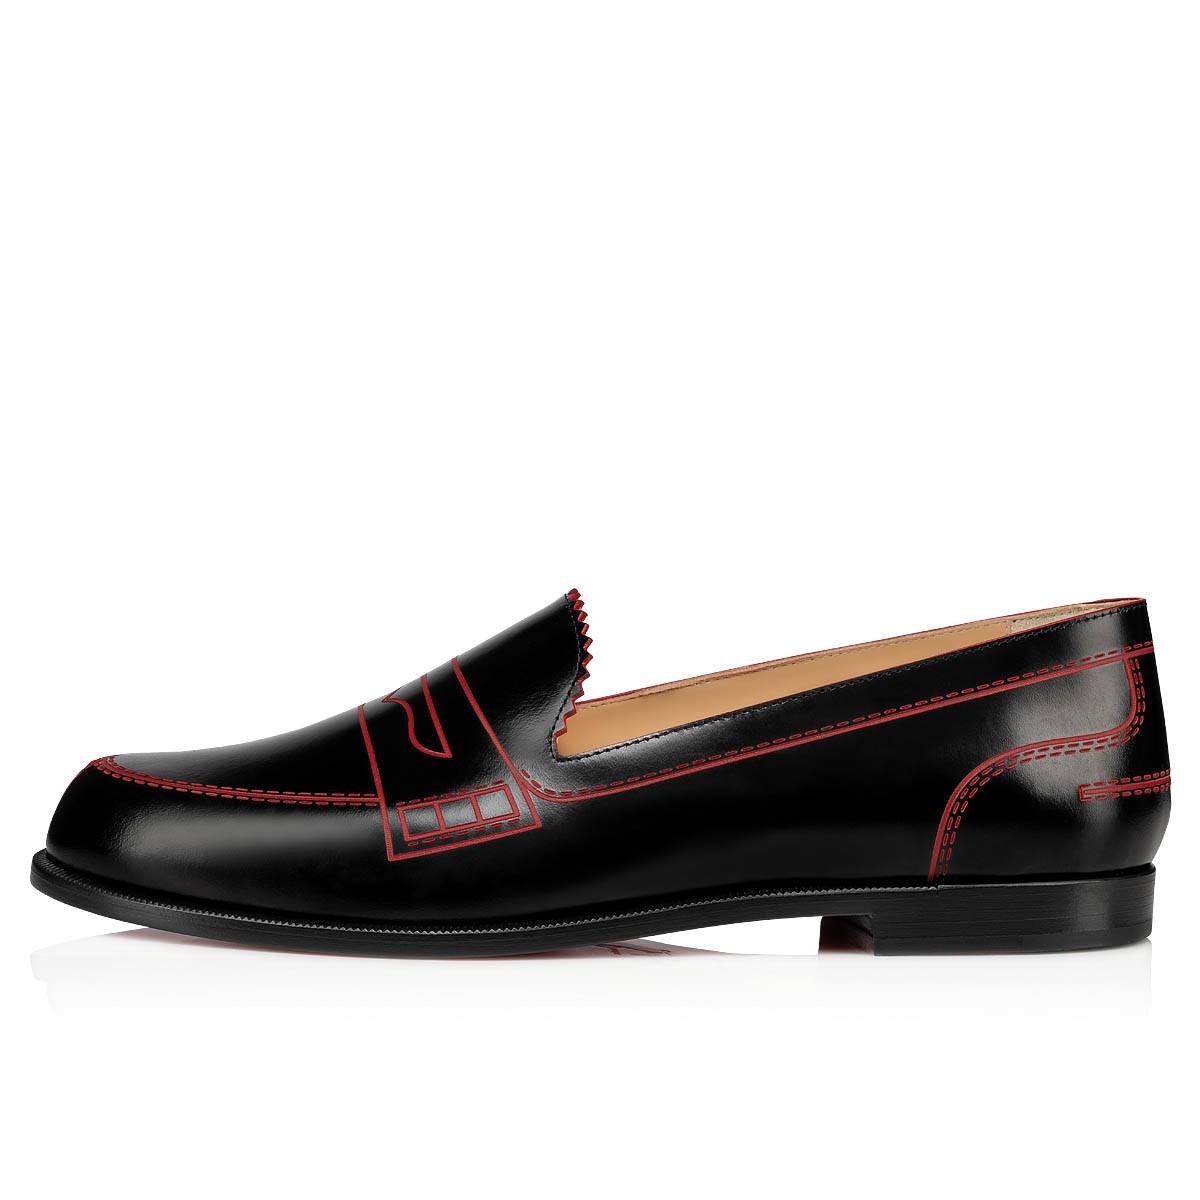 Shoes - Mocalaureat Flat - Christian Louboutin